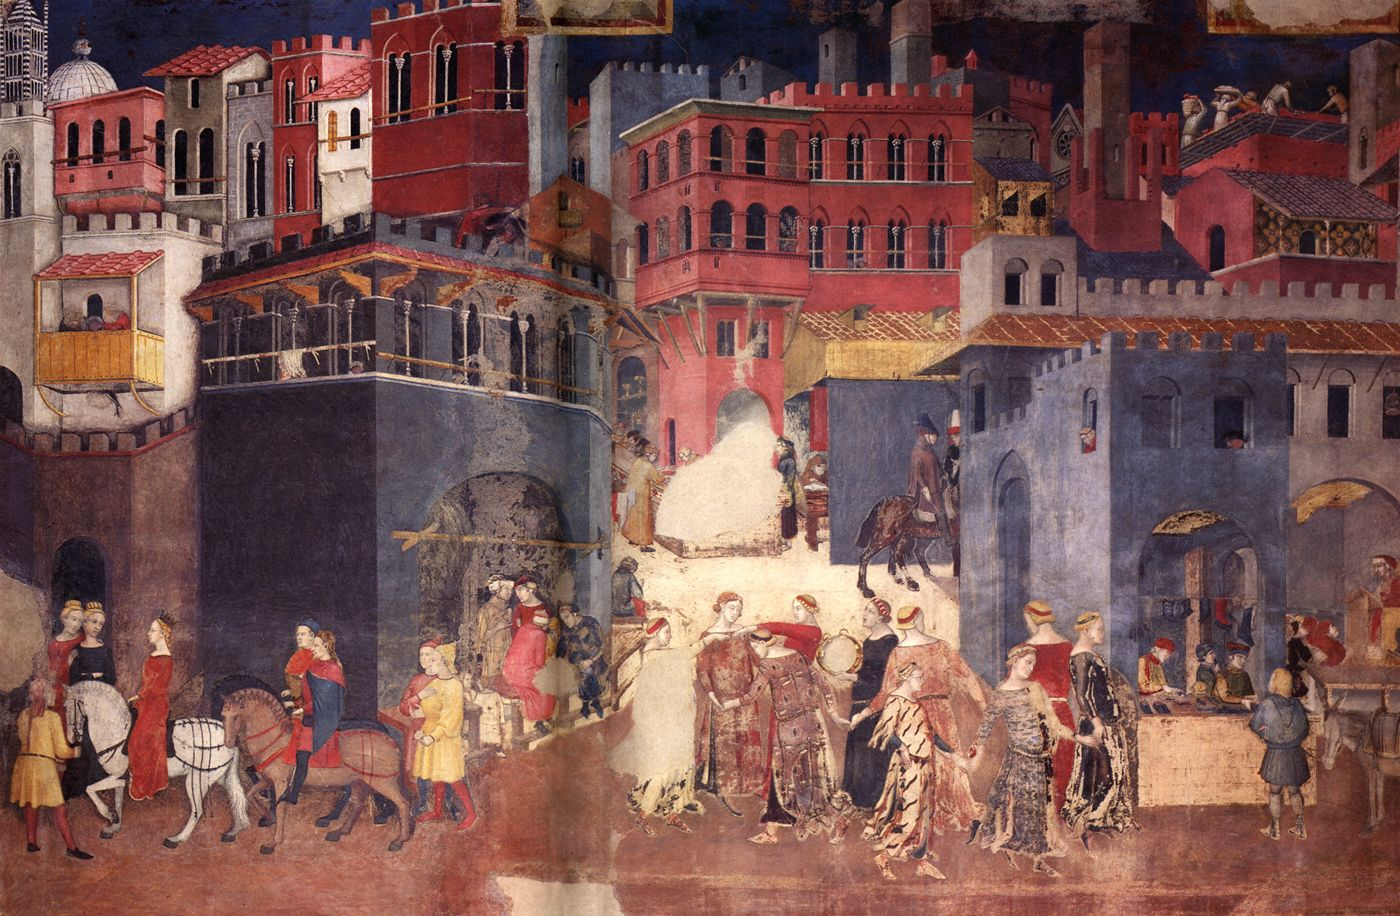 Ambrogio_Lorenzetti_Good_Government_town_1338-9